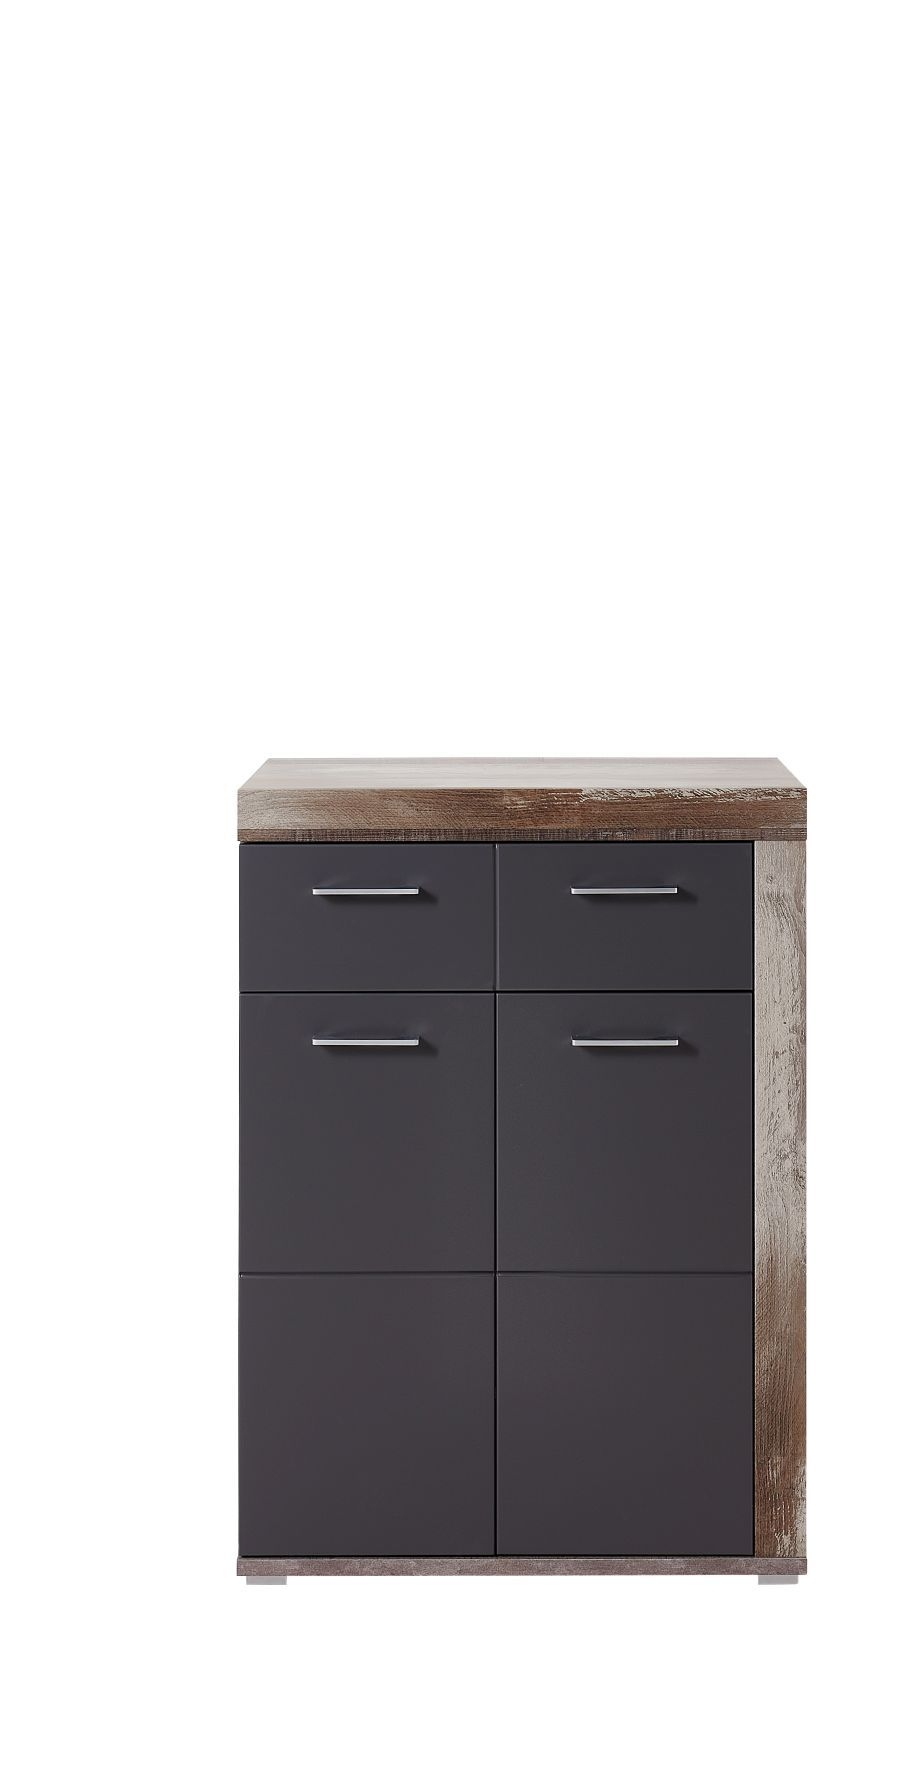 Cabinet din pal si MDF, cu 1 sertar si 2 usi Krone Grafit / Natur, l77xA38xH107 cm imagine